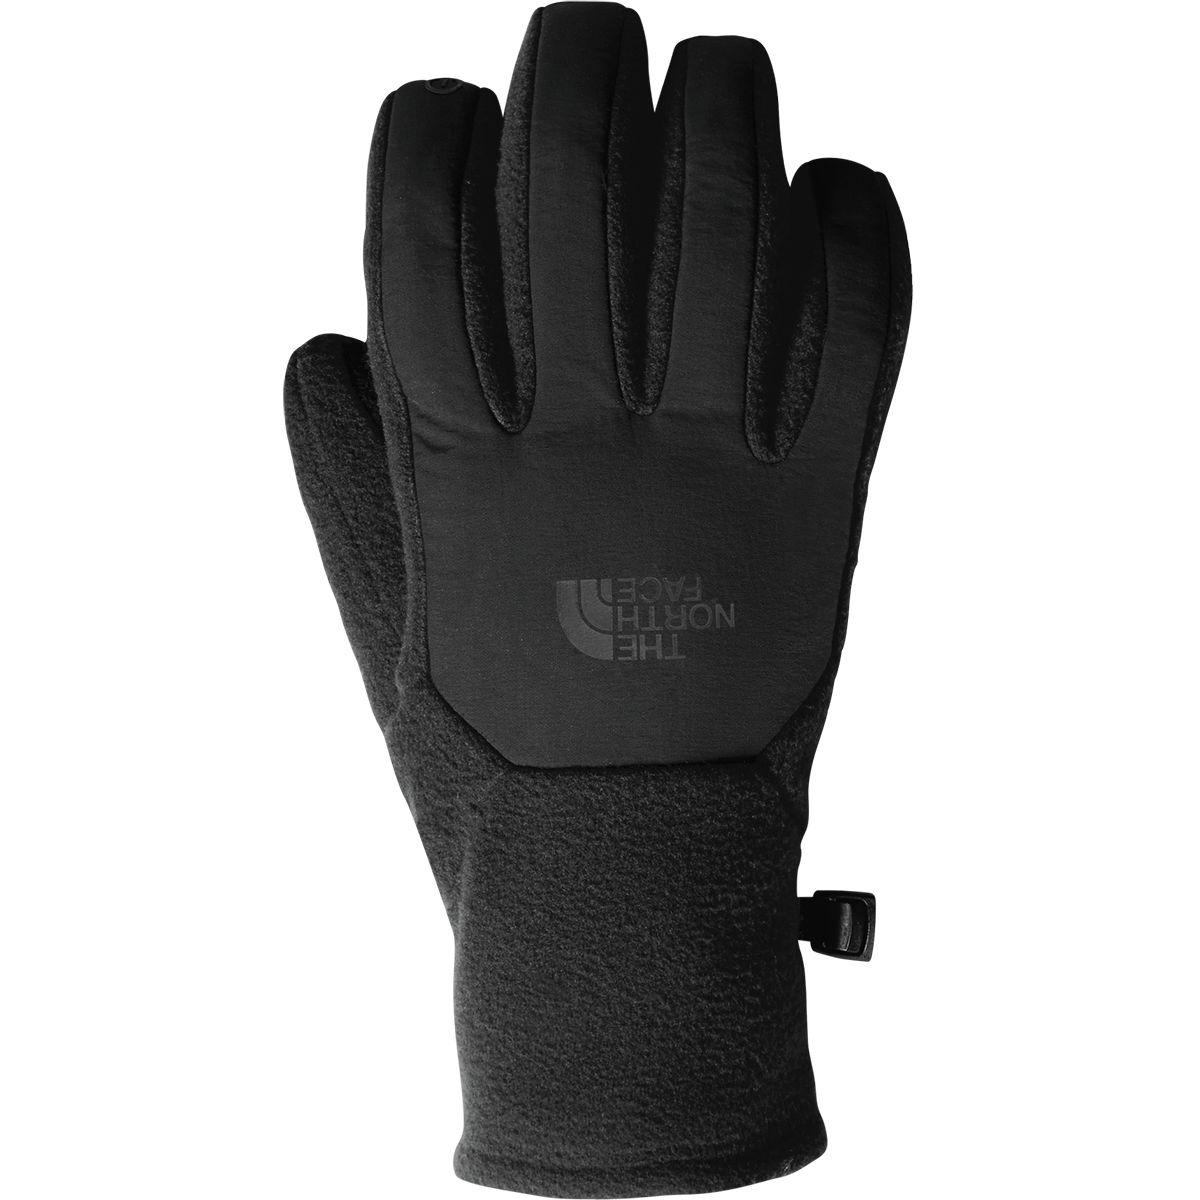 Fleece Gloves and Mittens